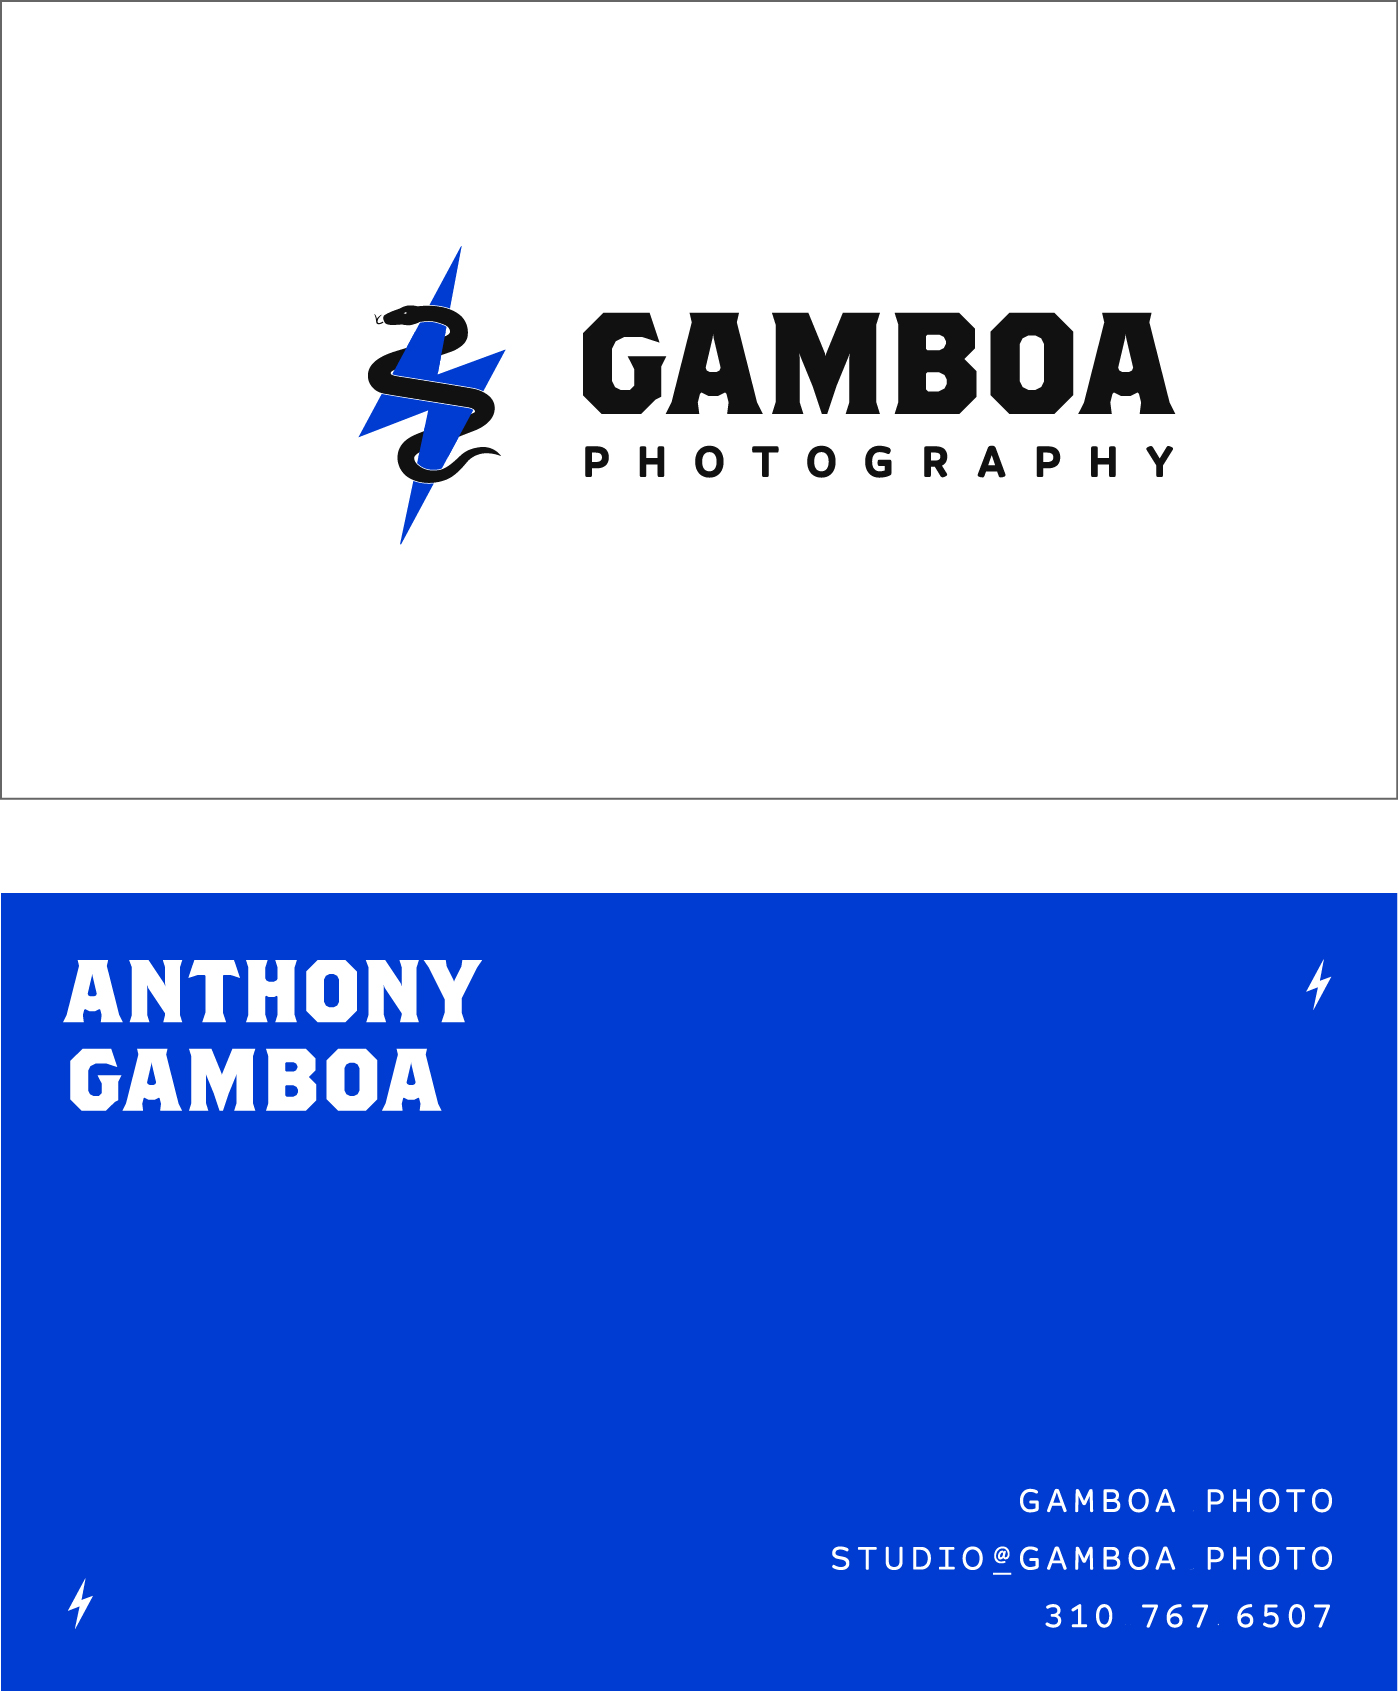 Gamboa_Business_Card_1.jpg